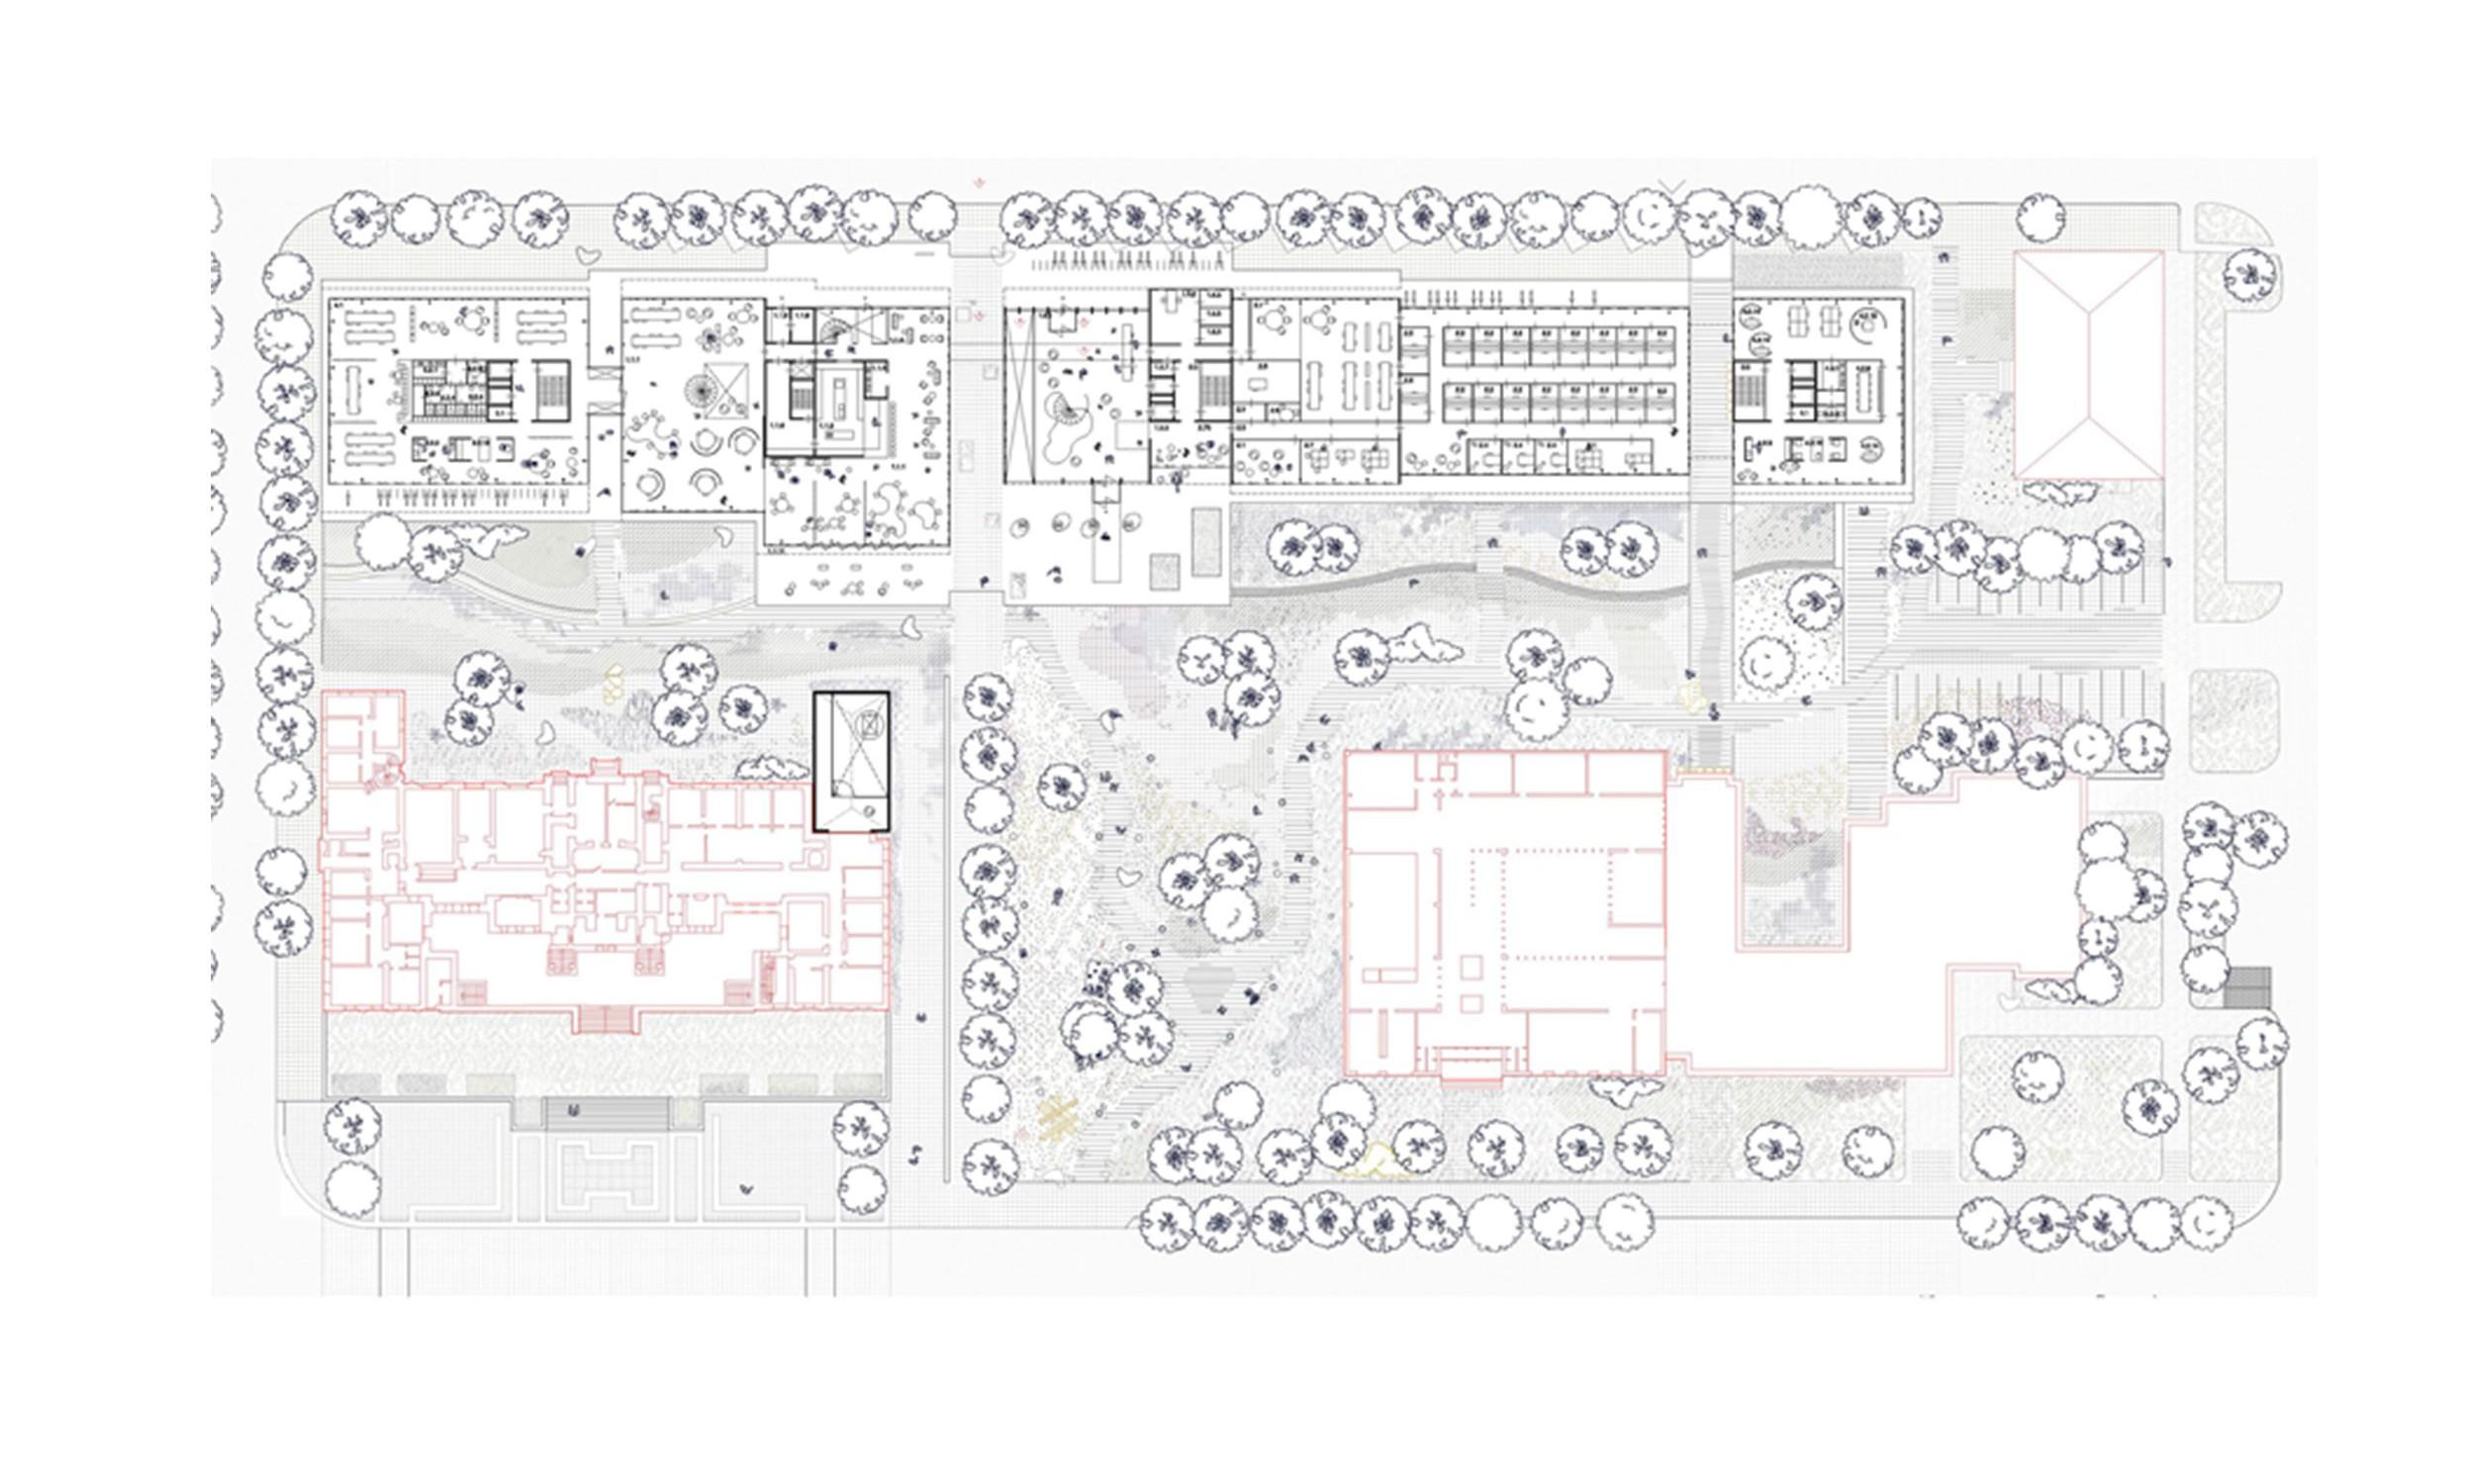 main_office_04_ostersund_site_plan